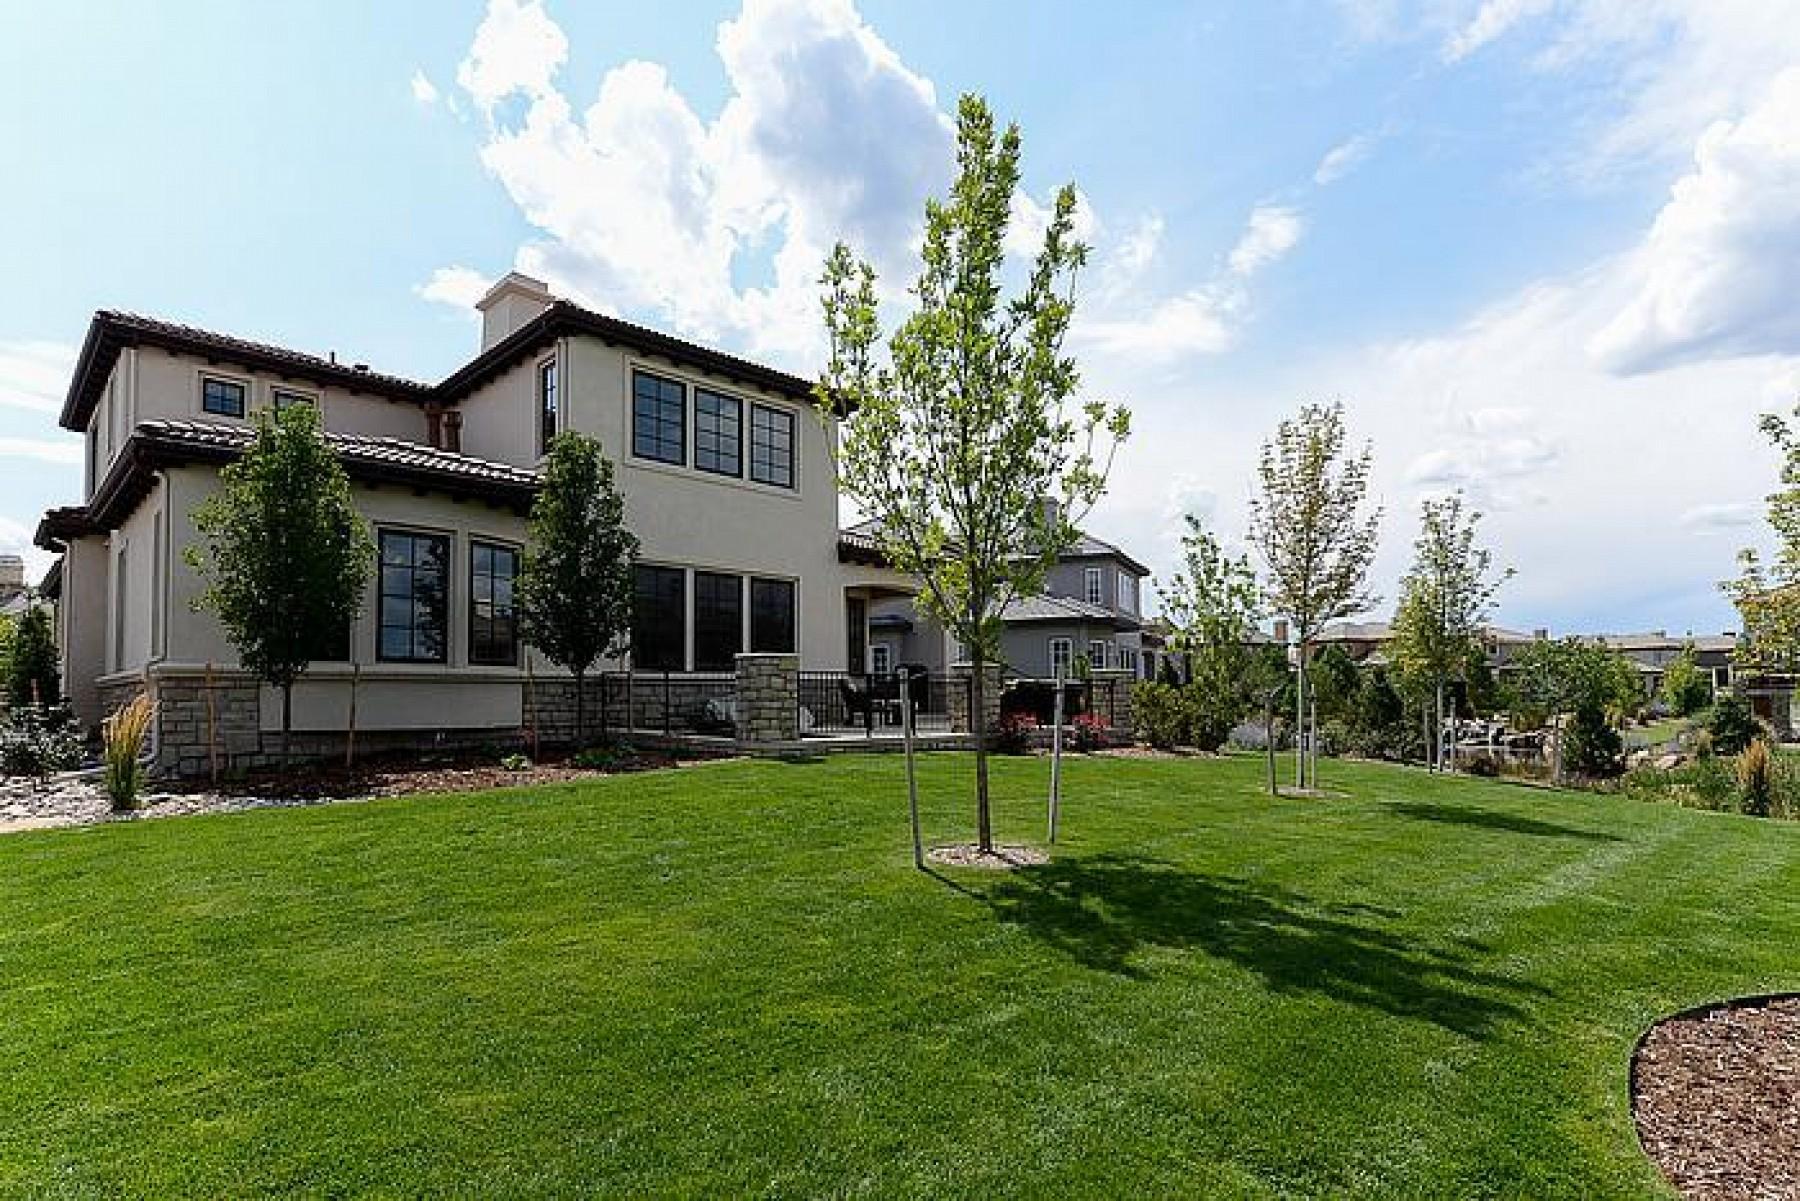 9235 E. Vassar Avenue, Denver, CO 80231